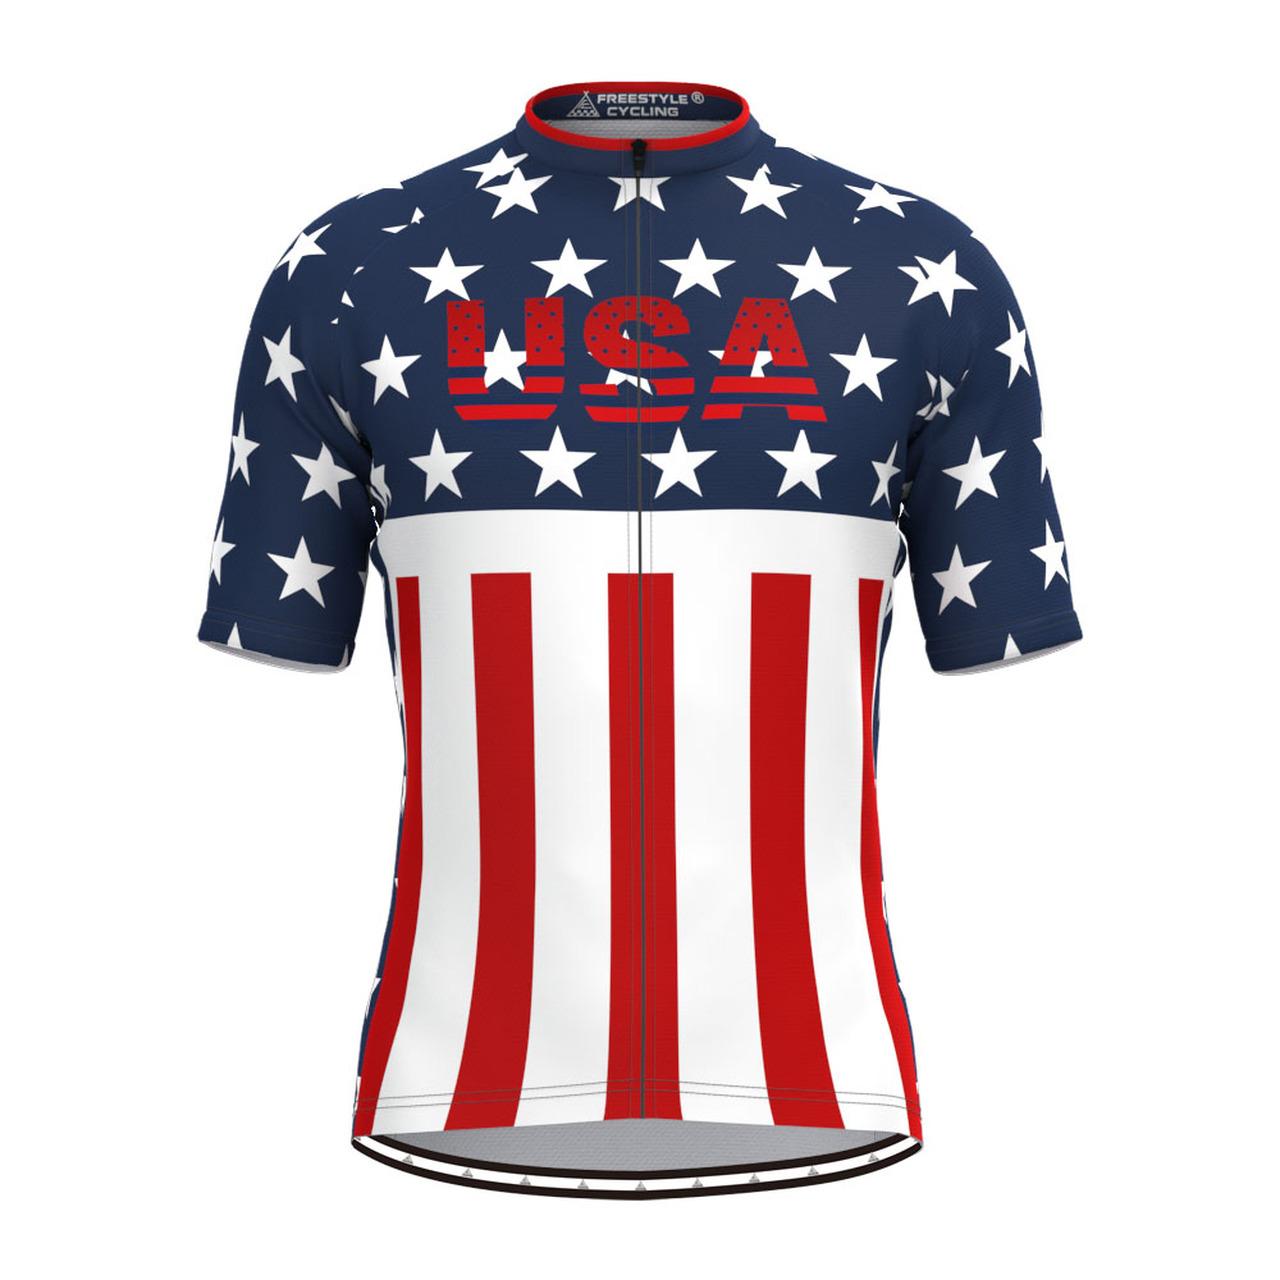 USA_National_Flag_Team_Mens_Cycling_Jerseys_1__08958.1622518130.0.jpg